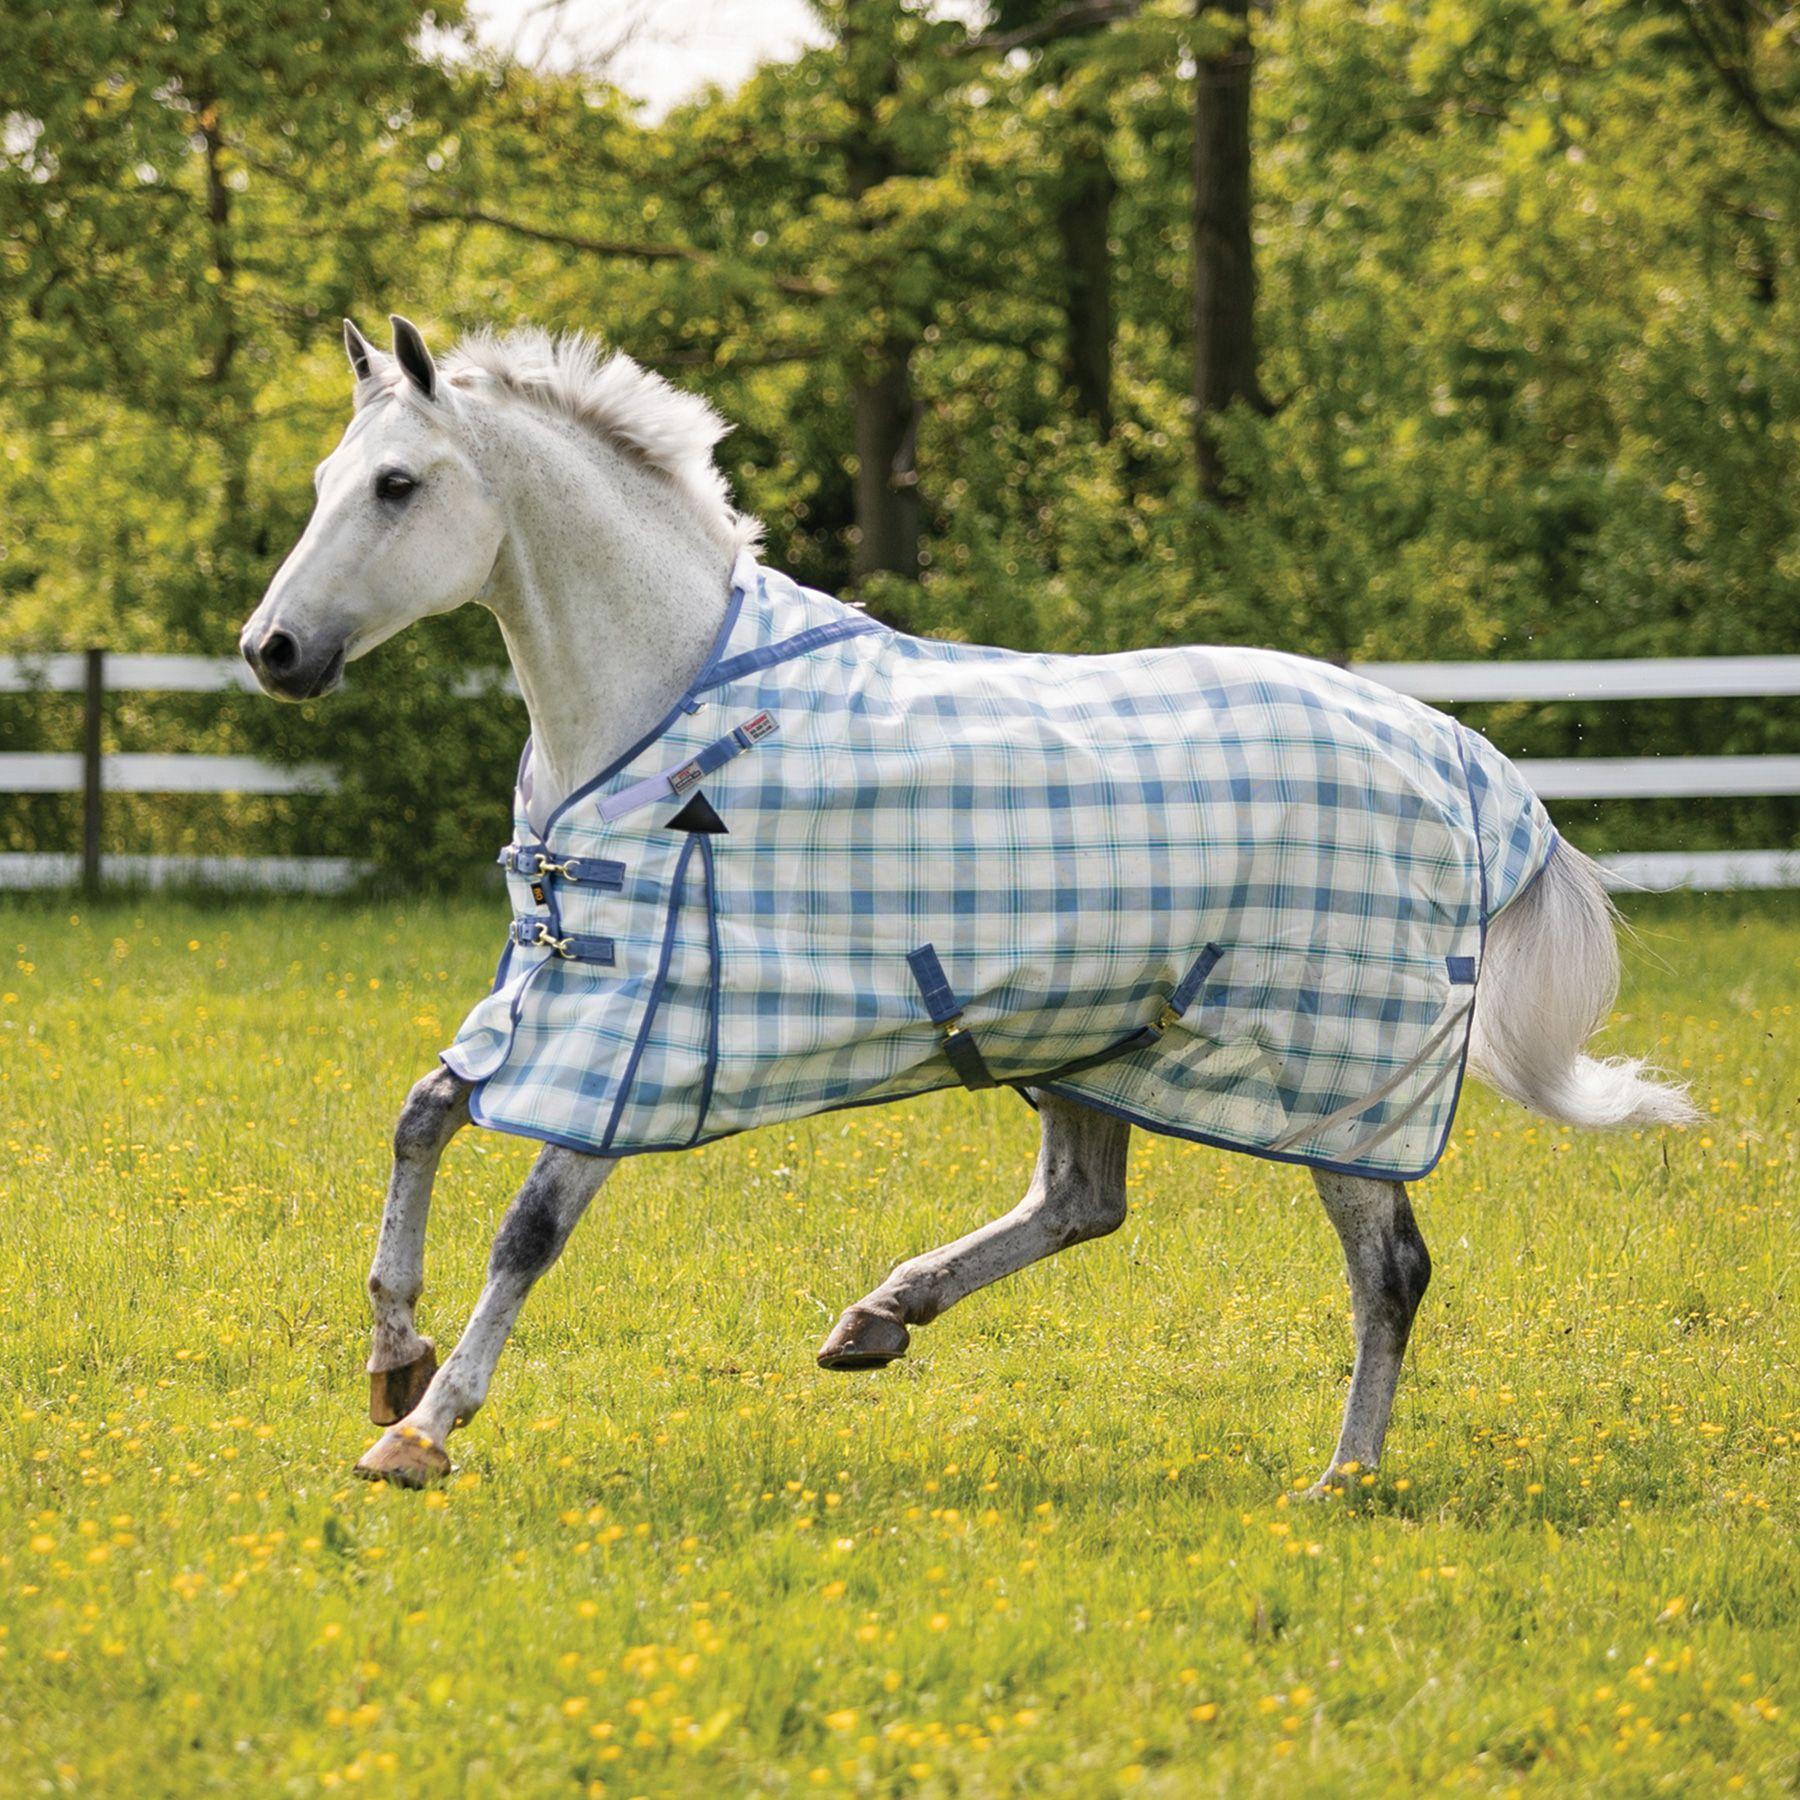 Dura Mesh Vtek Surcingle Fly Sheet Horsewear Durable Vinyl Breeds